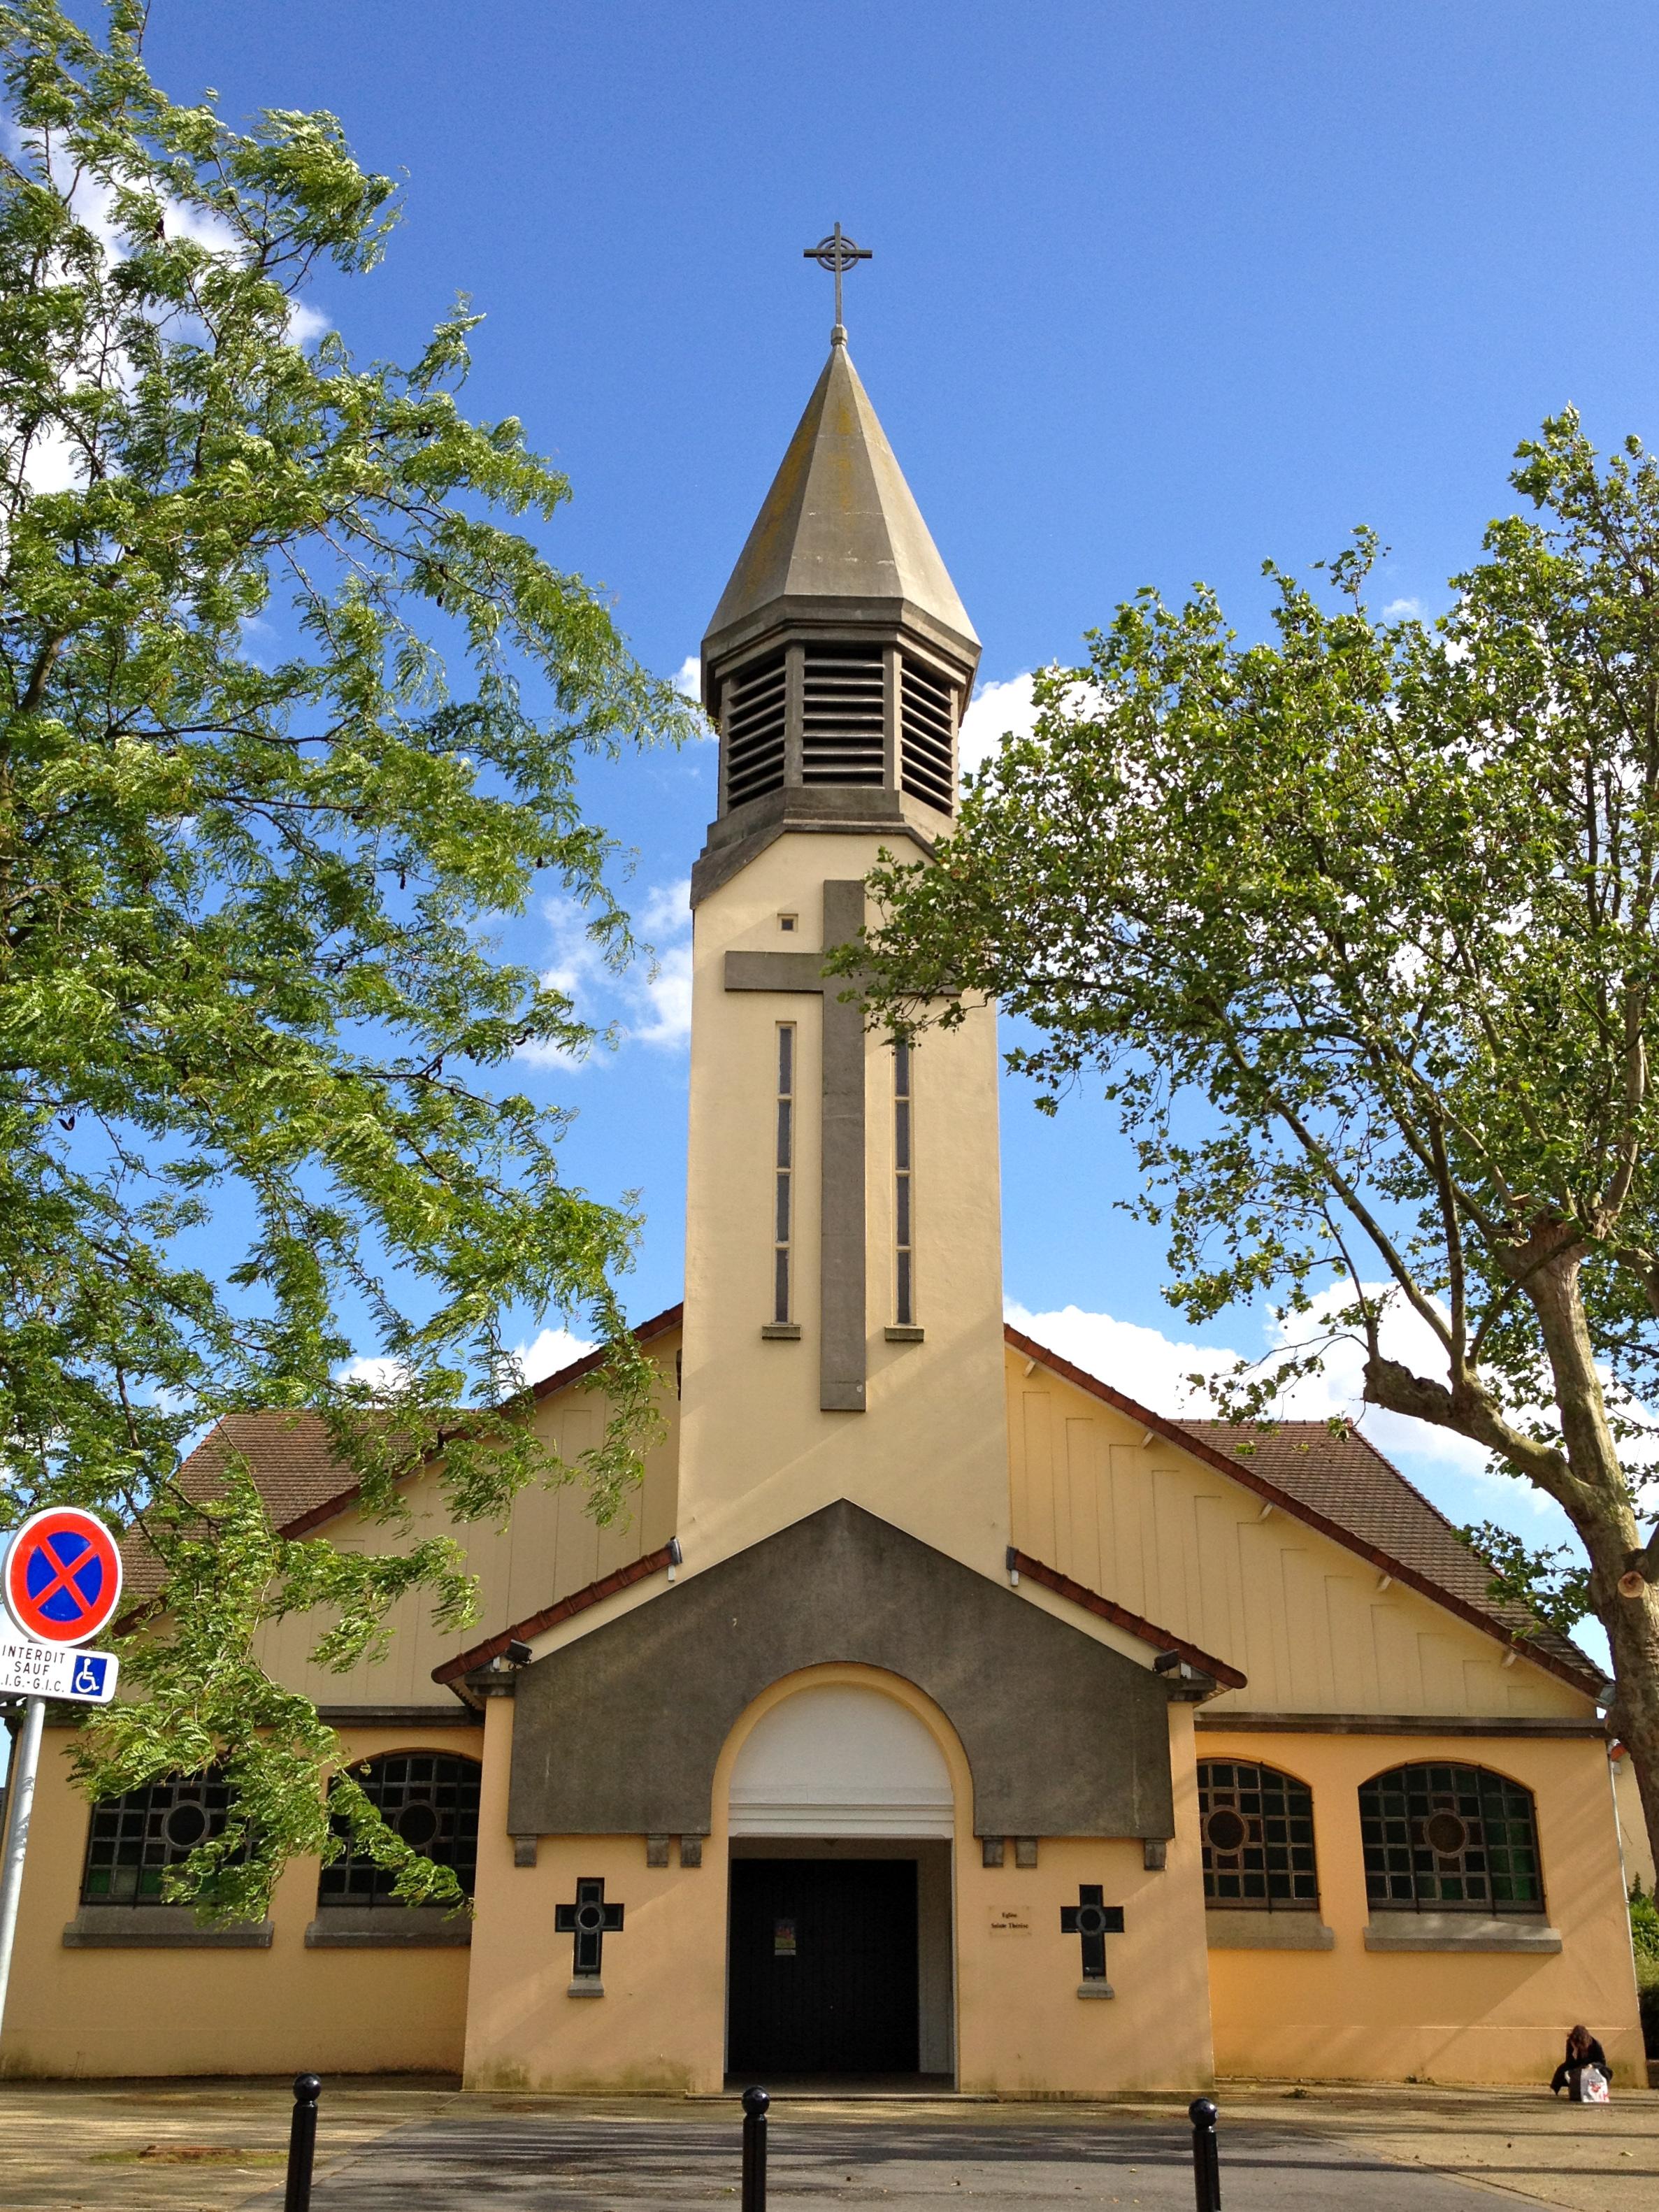 Gc541e5 glise sainte th r se traditional cache in le - Eglise sainte therese guilherand granges ...